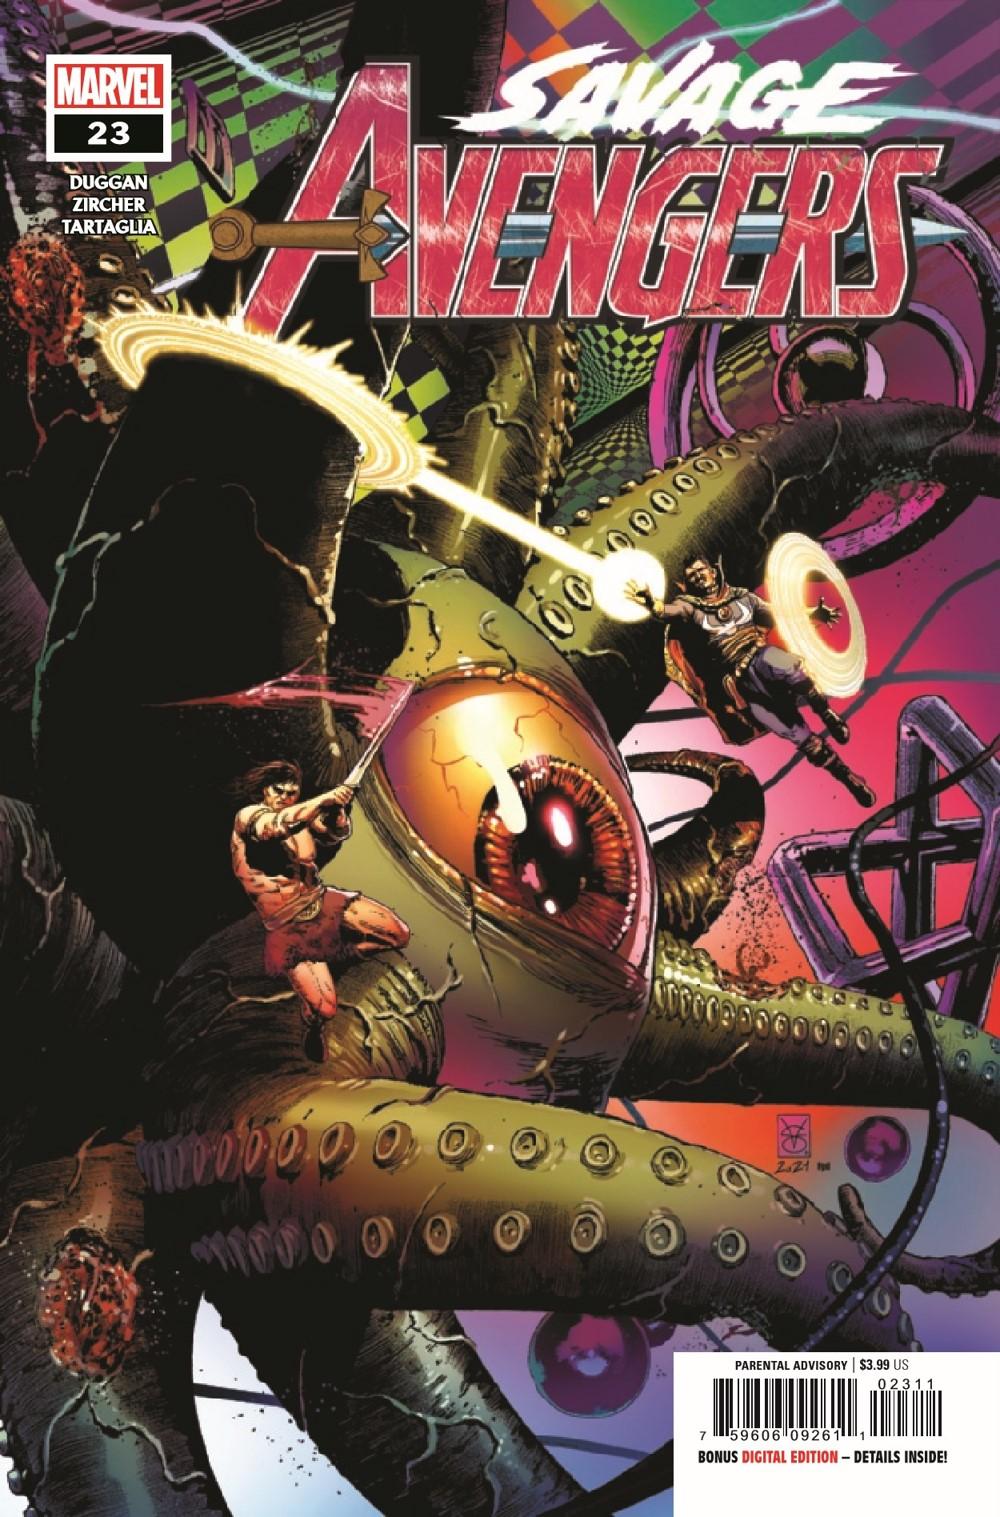 SAVAVEN2019023_Preview-1 ComicList Previews: SAVAGE AVENGERS #23